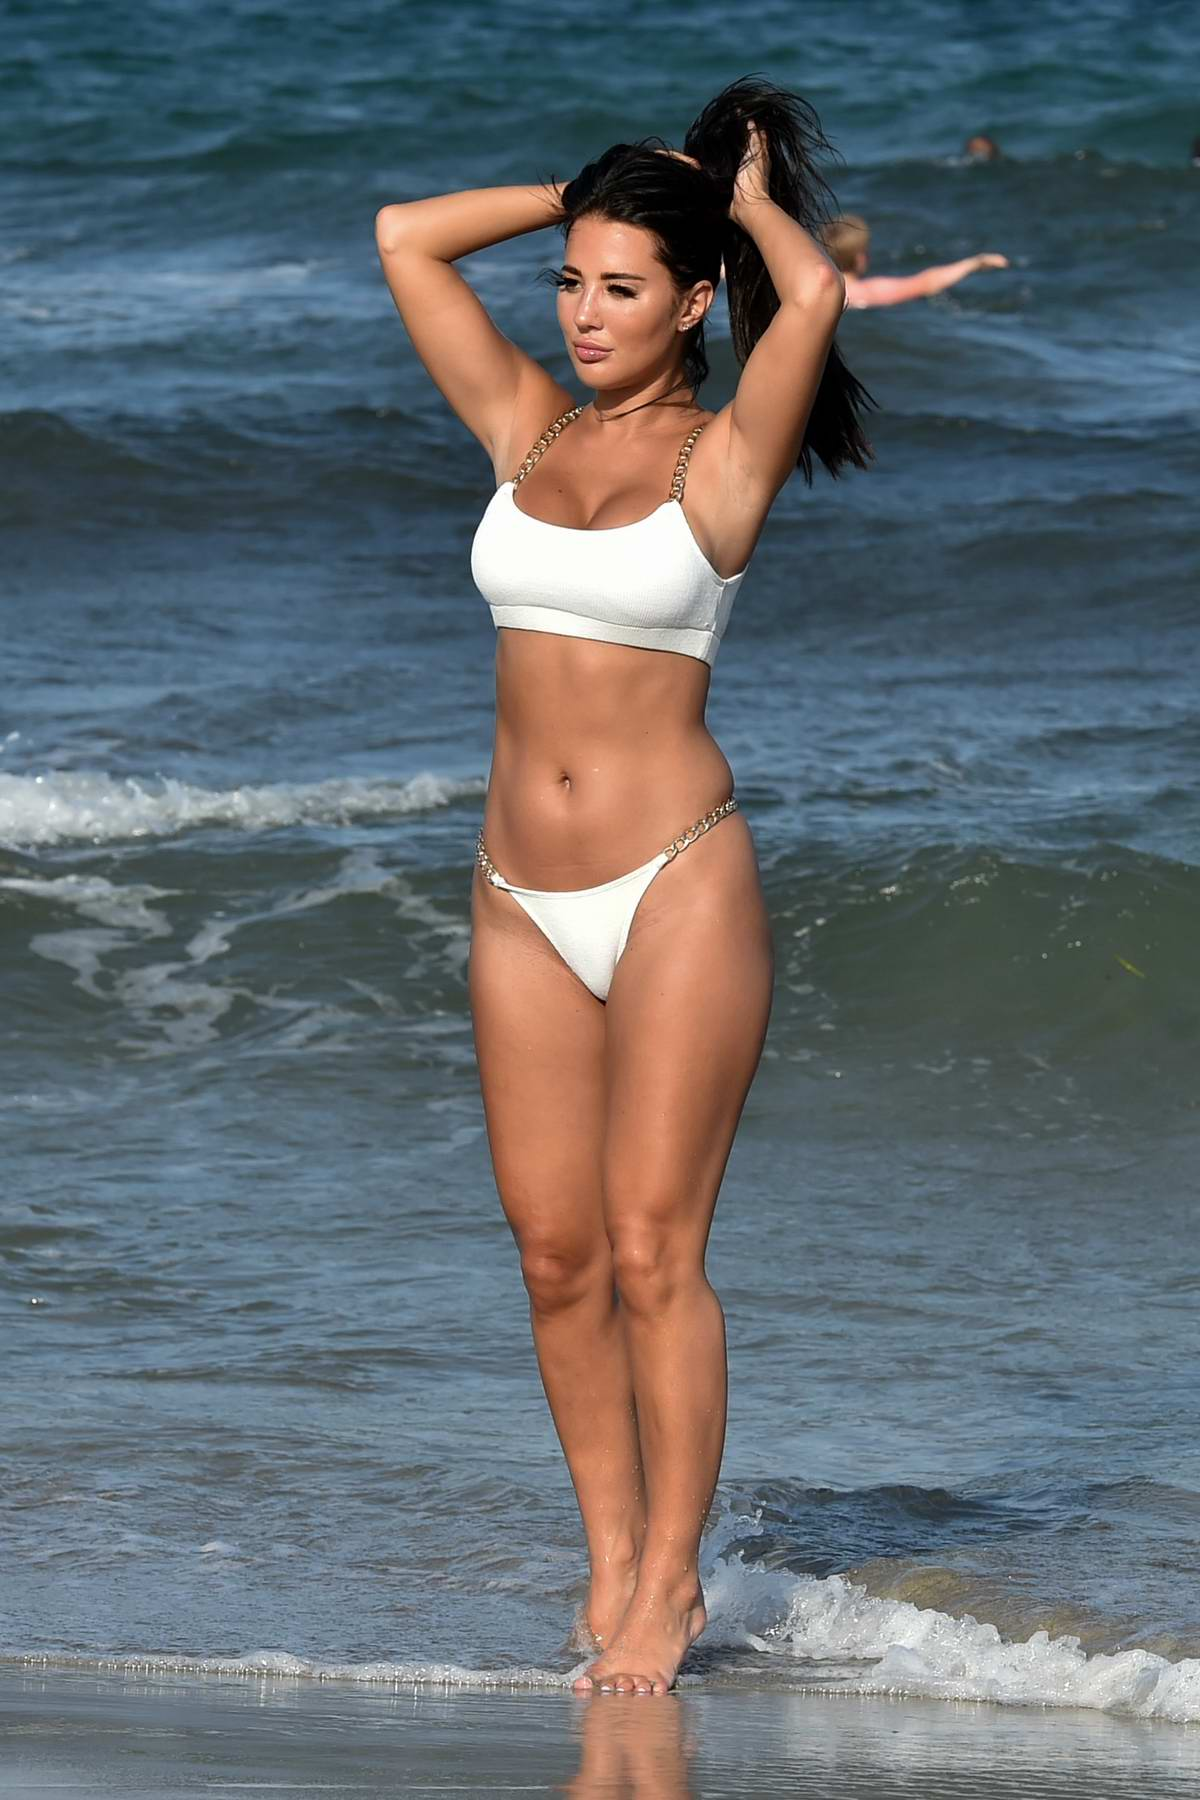 Yazmin Oukhellou shows off her bikini body as she enjoys some time on the beach in Dubai, UAE